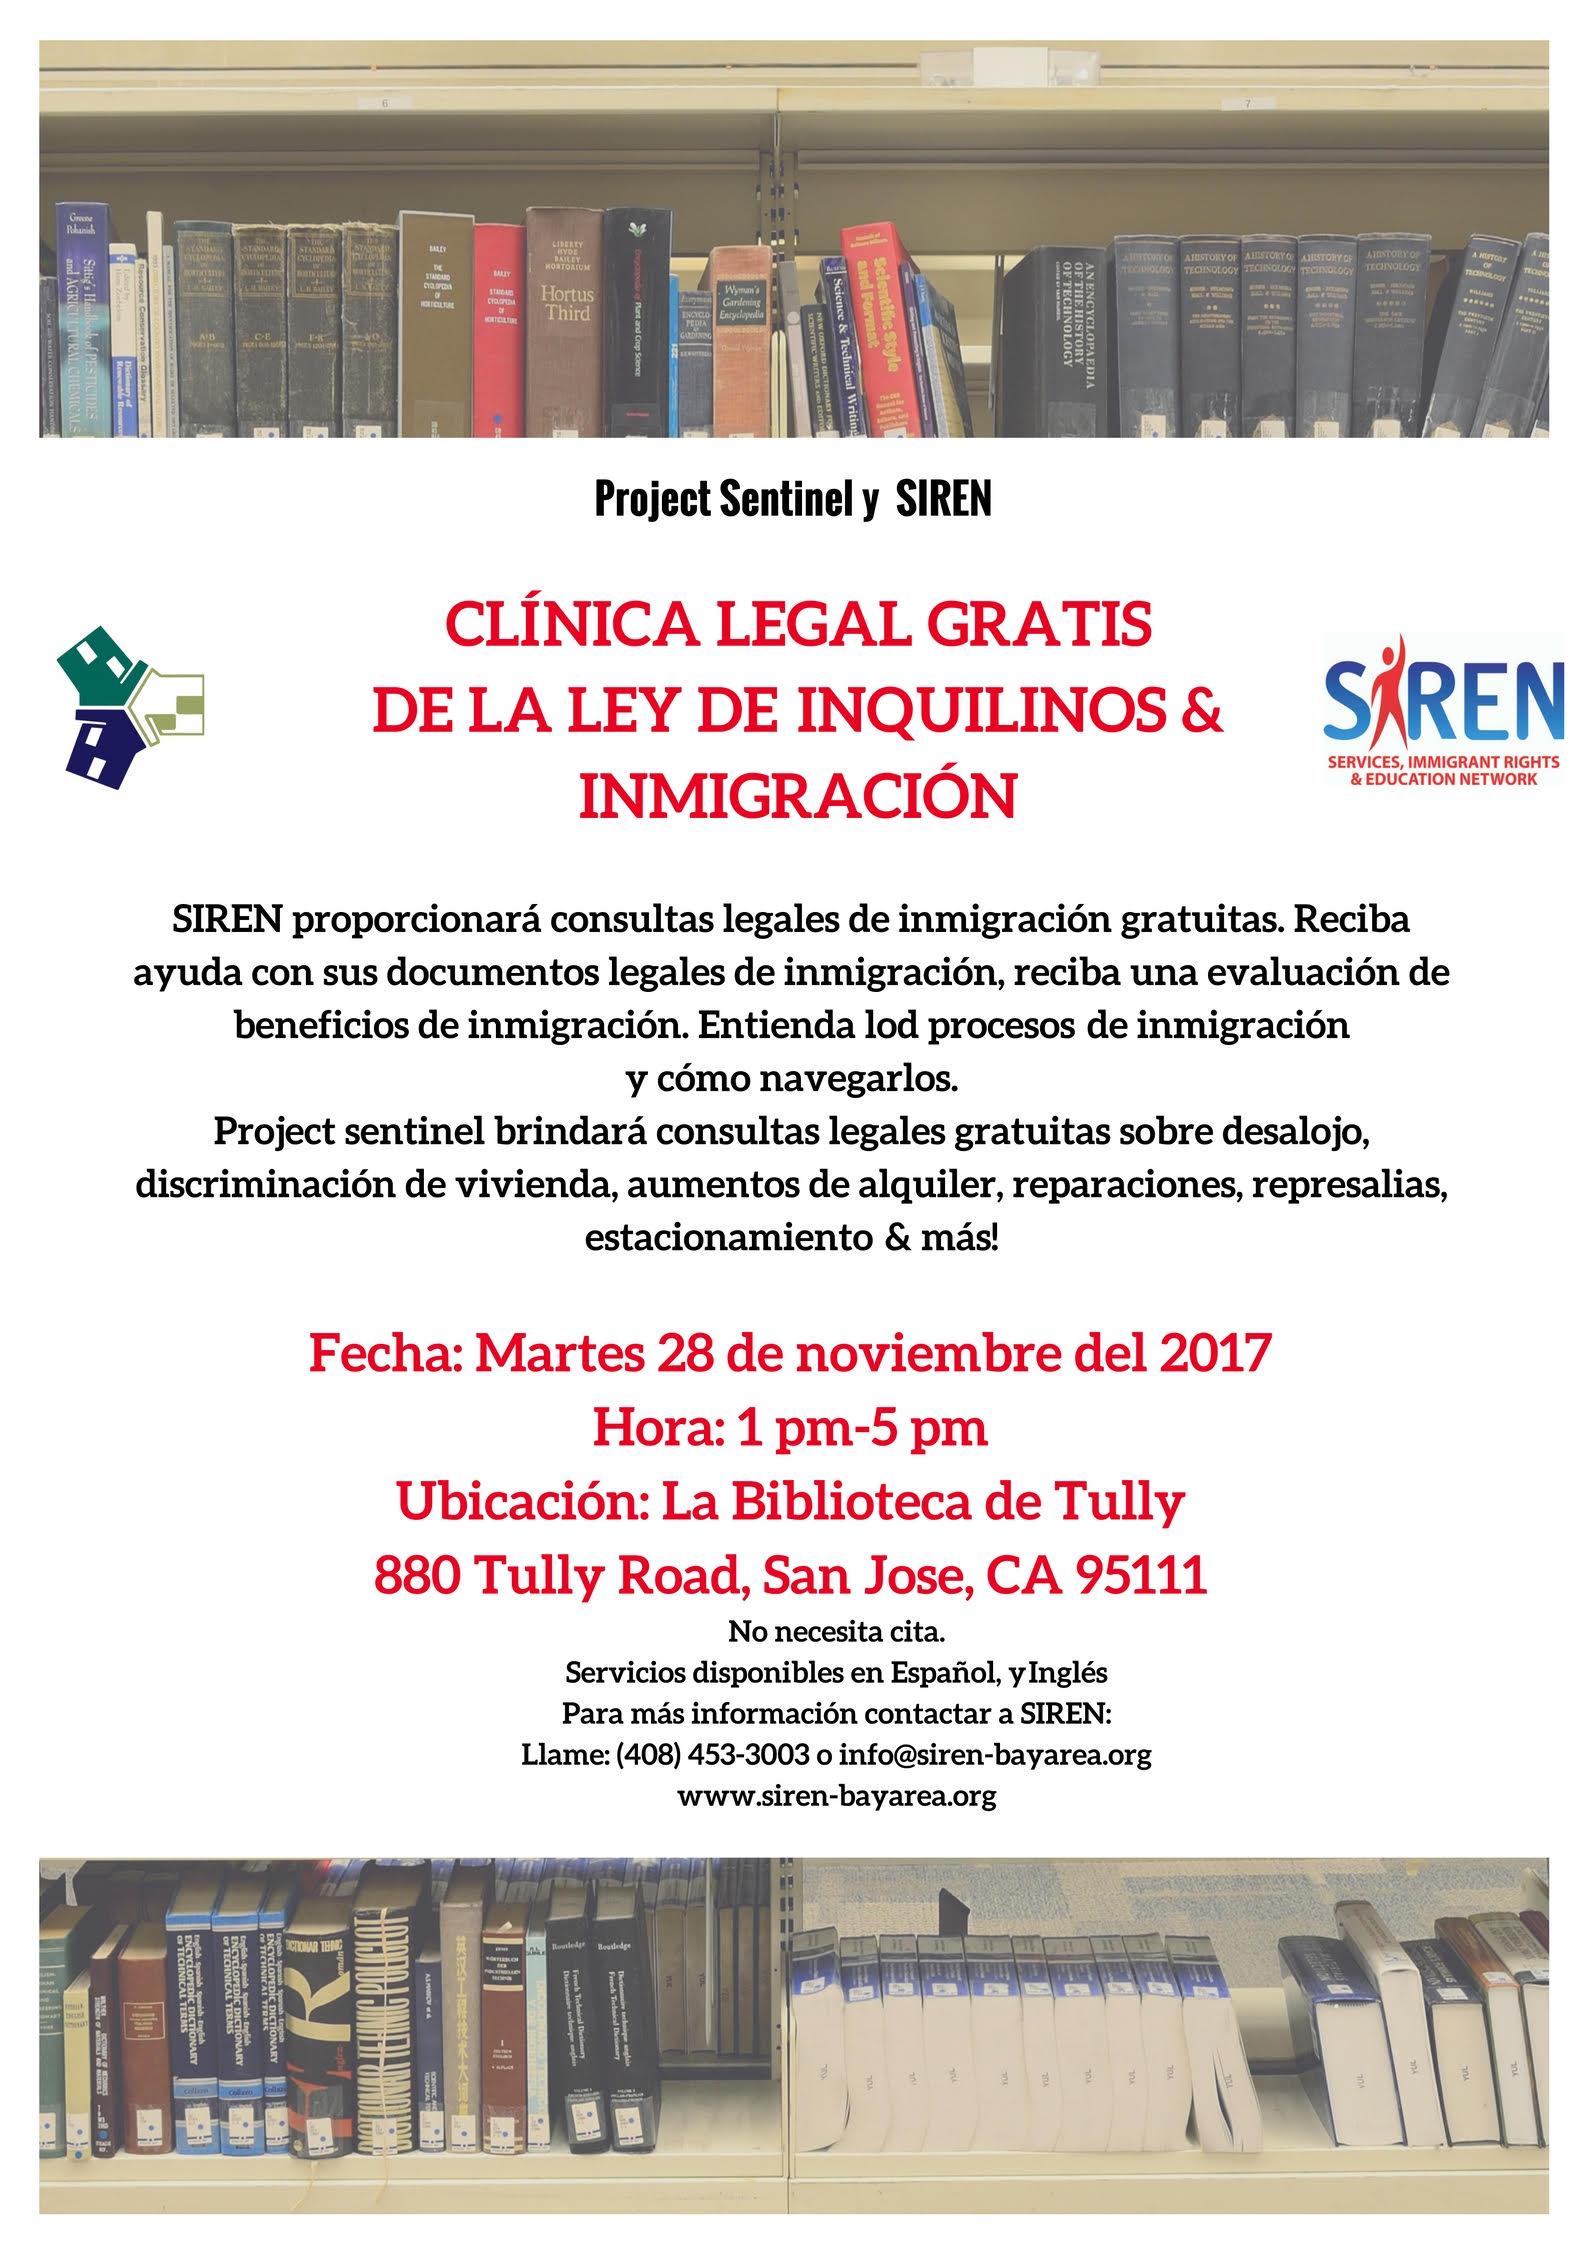 SIREN-clinica-legal-gratis-de-la-ley-inquilinos-immigracion.jpg